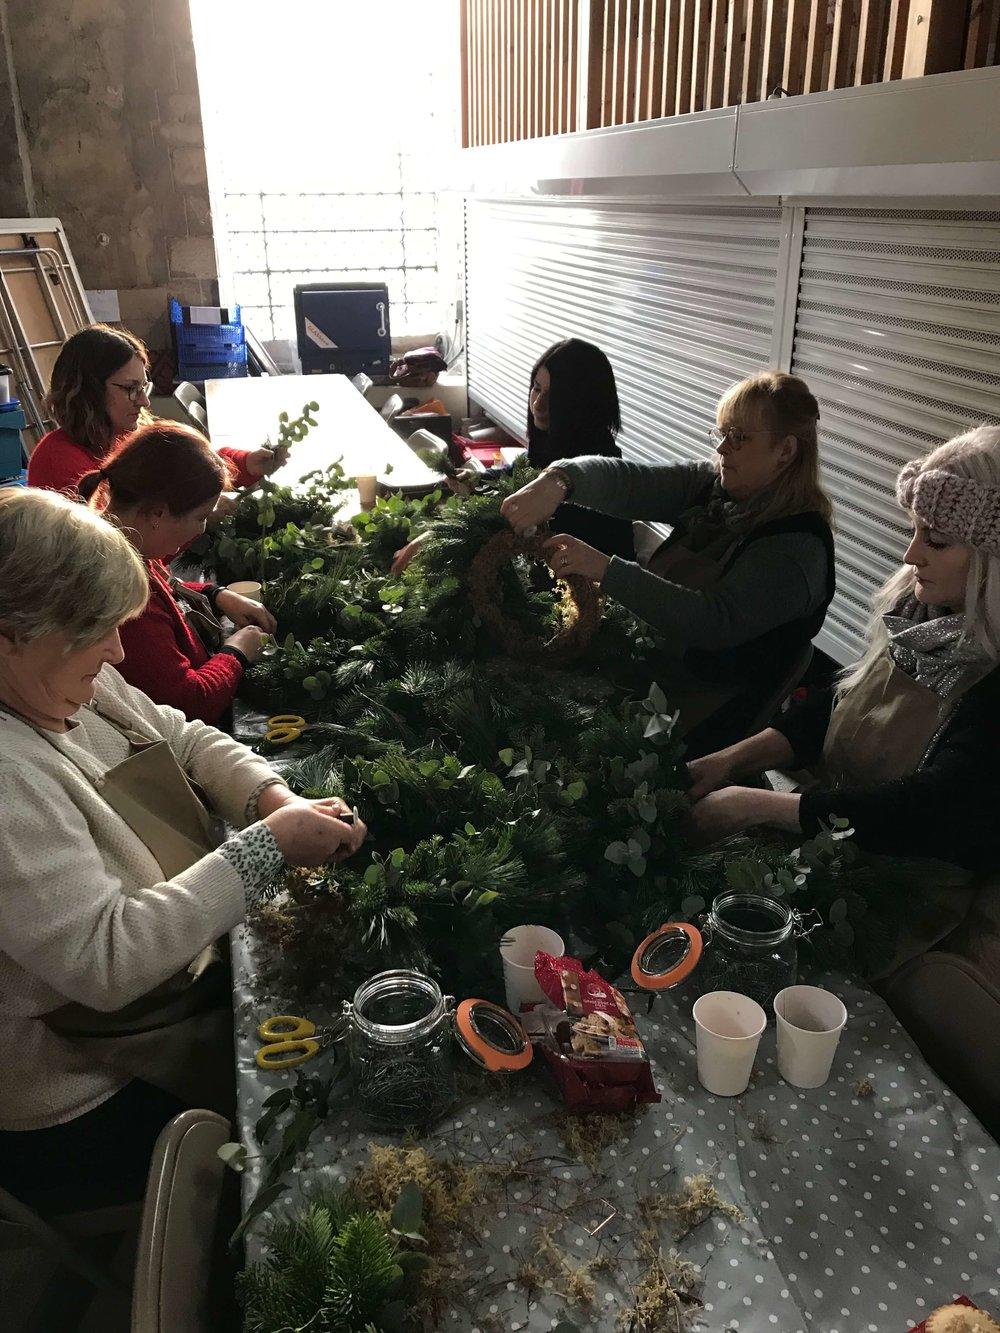 Christmas Wreath Making Workshop Ely Cambridgeshire 16th December Group Shot 2.jpg